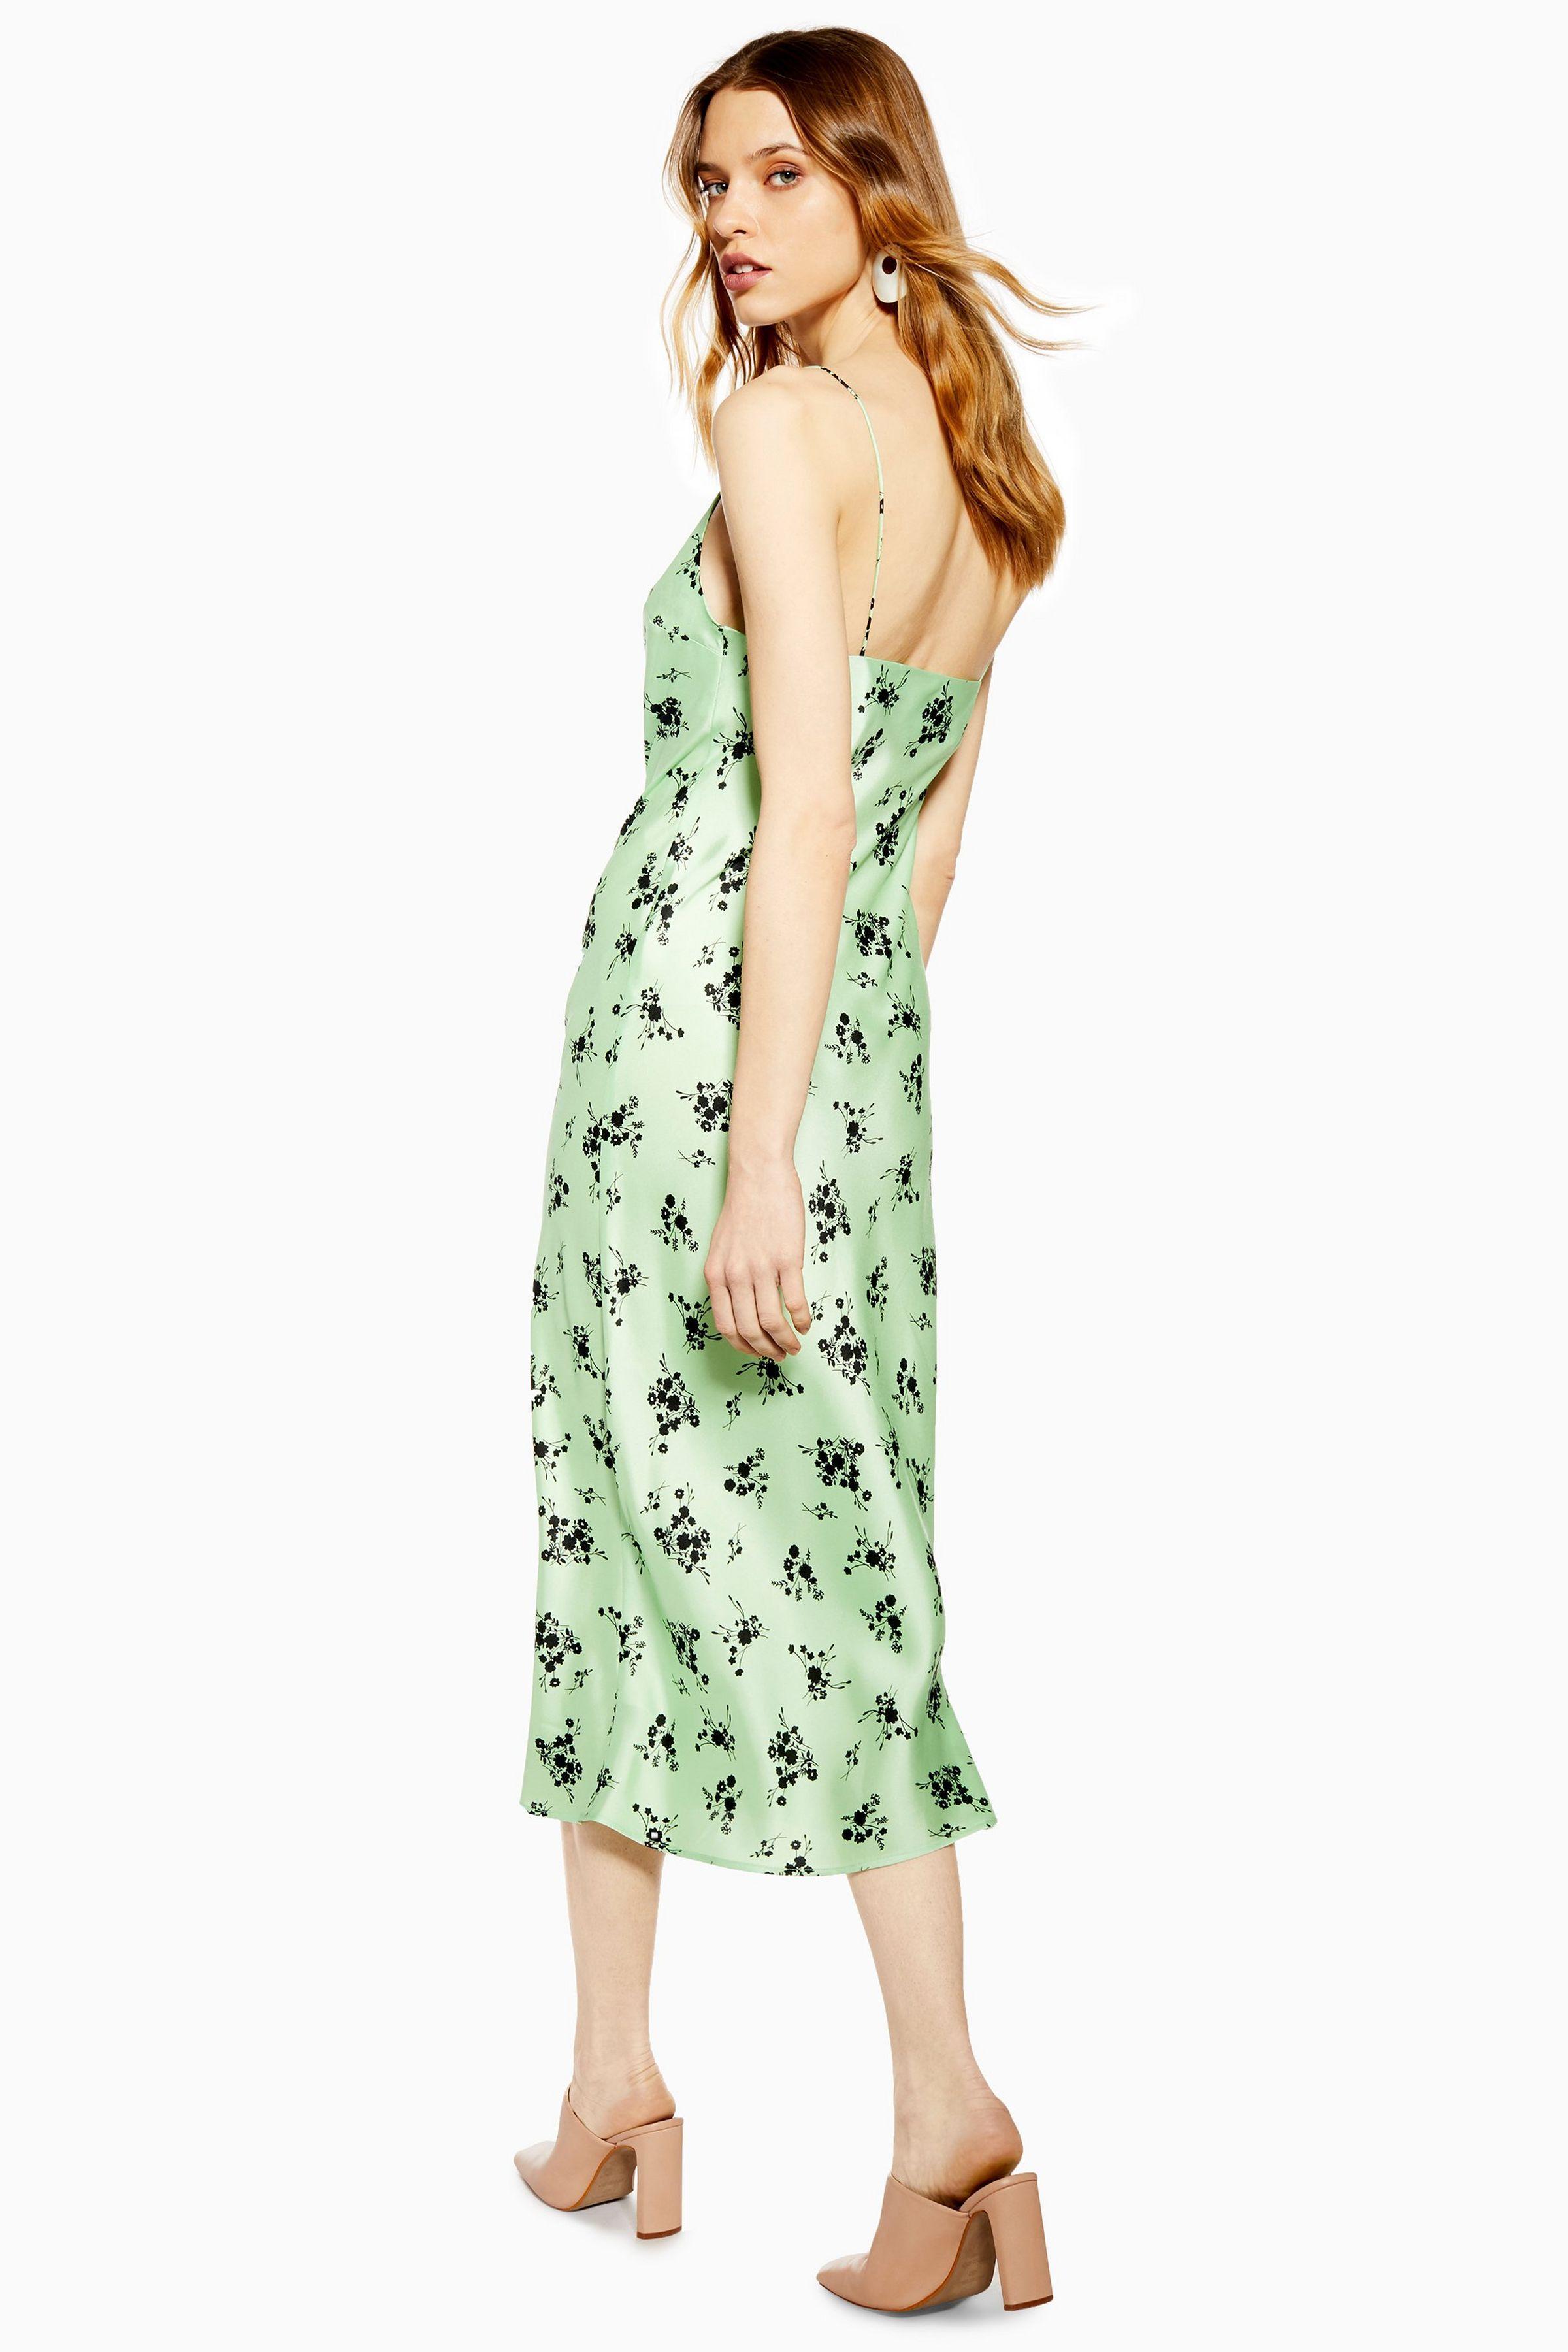 baf40c6958d9 Apple Satin Bias Slip Dress in 2019 | My Prints 2019 | Dresses ...